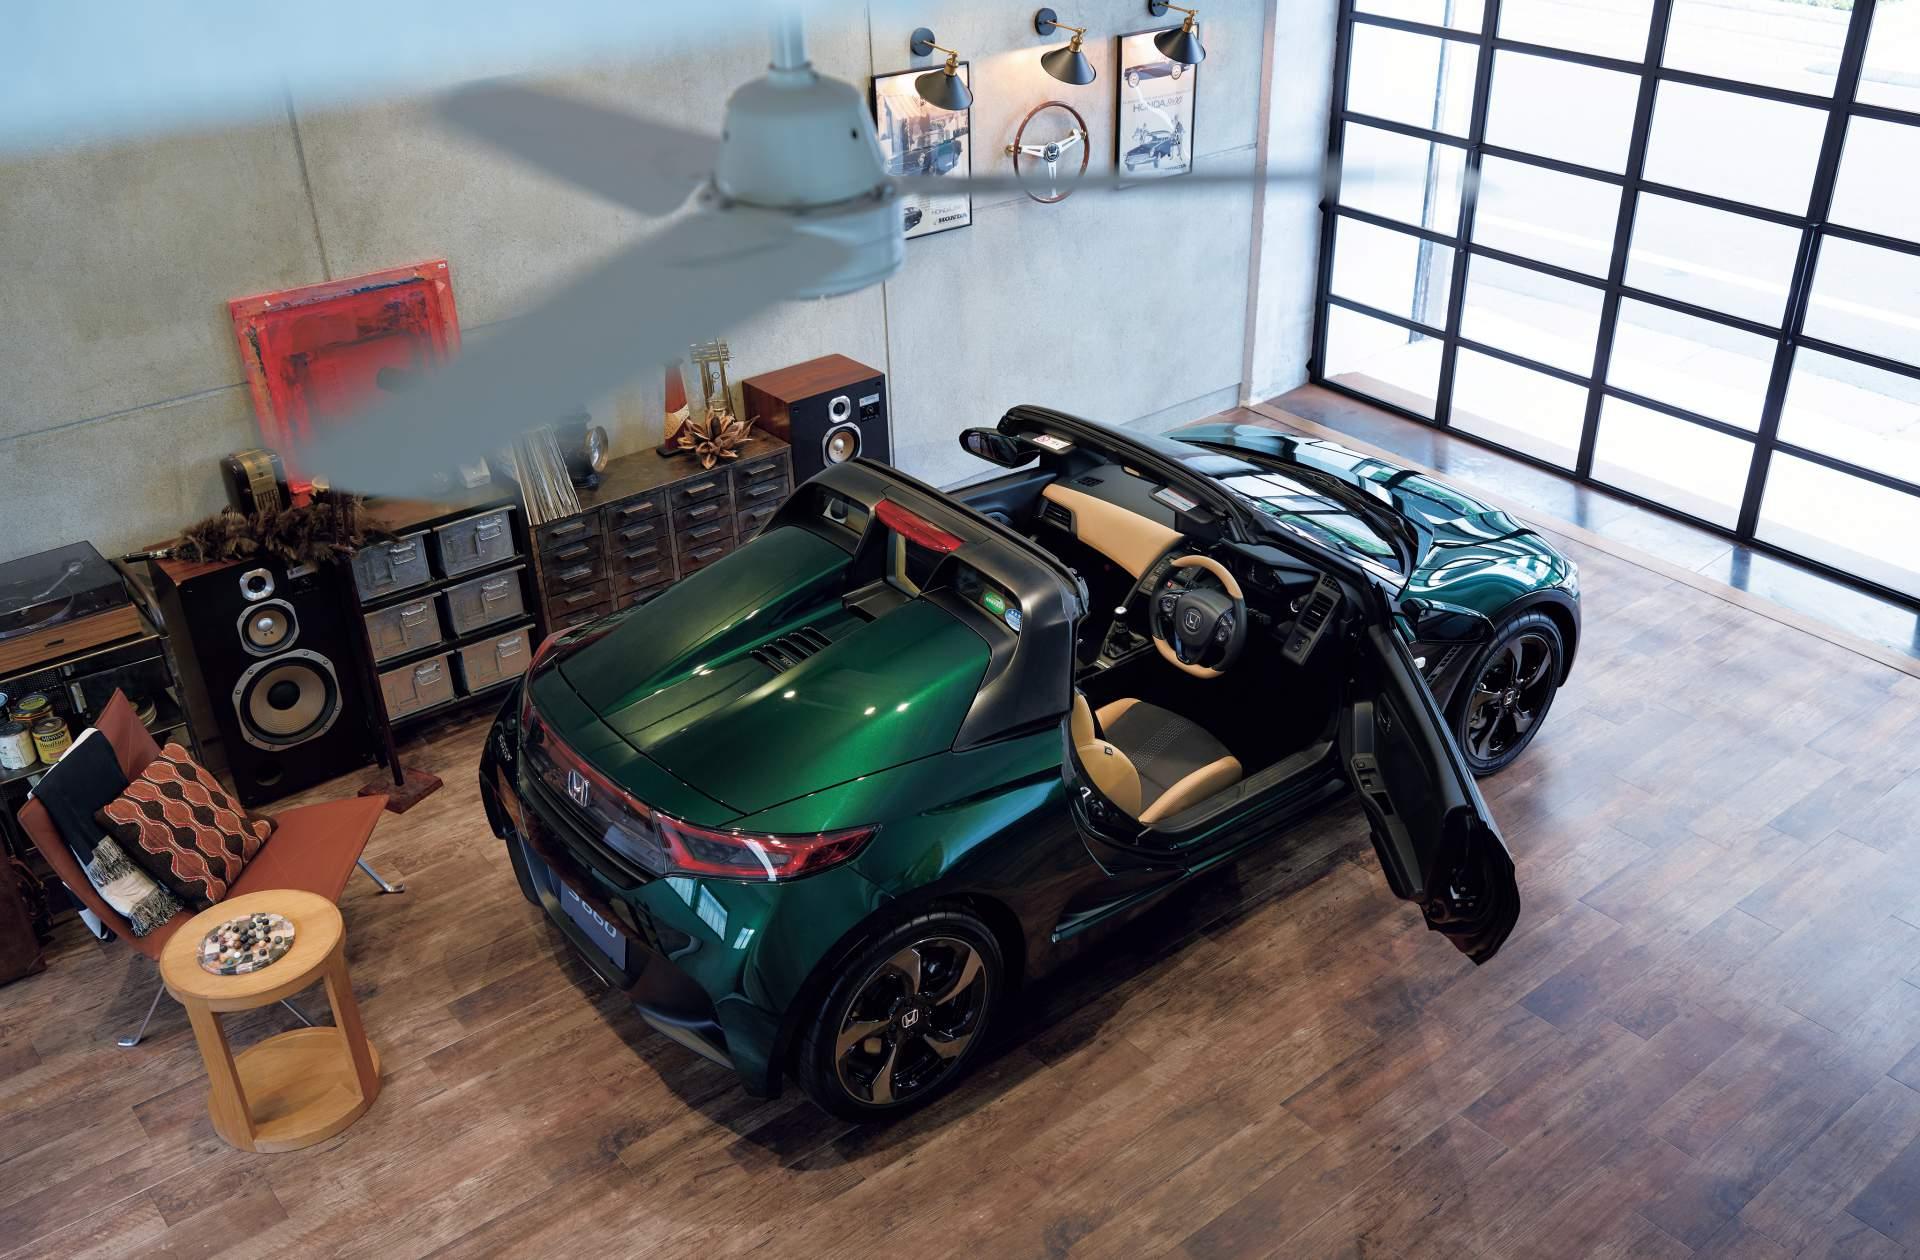 Honda_S660_Trad_Leather_Edition_0003